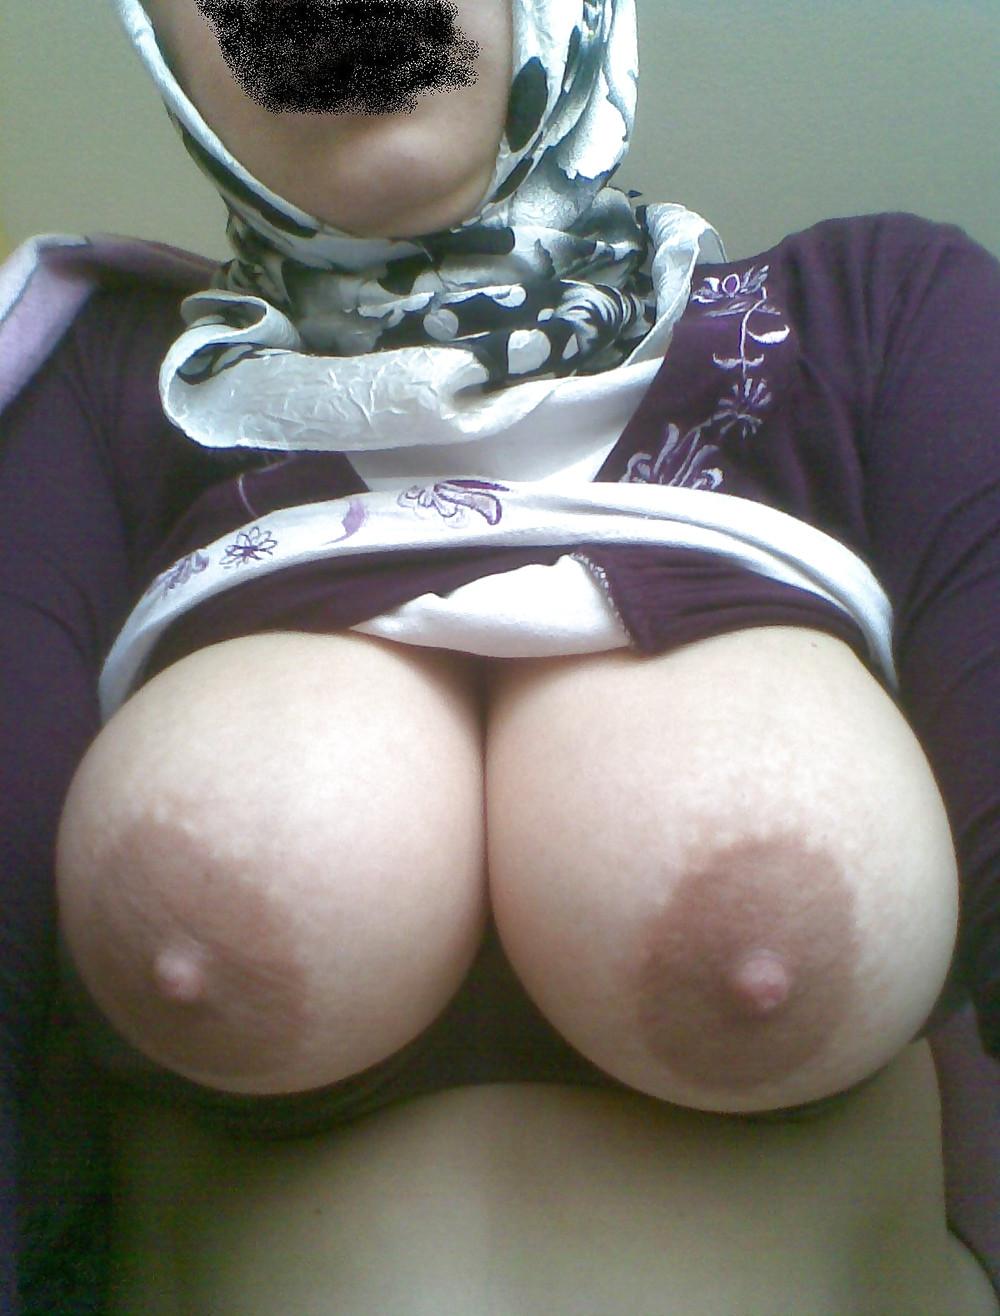 Turkish big tits koca memeli hatun - 3 part 2